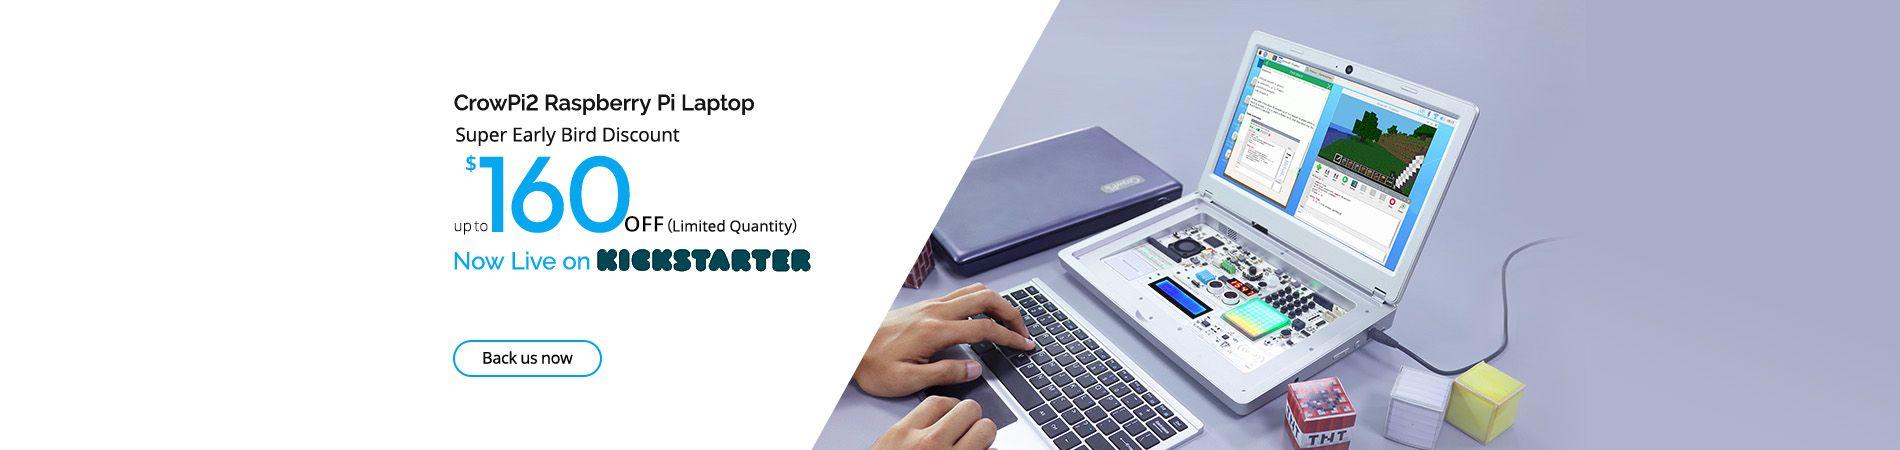 https://www.kickstarter.com/projects/elecrow/crowpi2-steam-education-platformand-raspberry-pi-laptop?ref=discovery&term=crowpi2